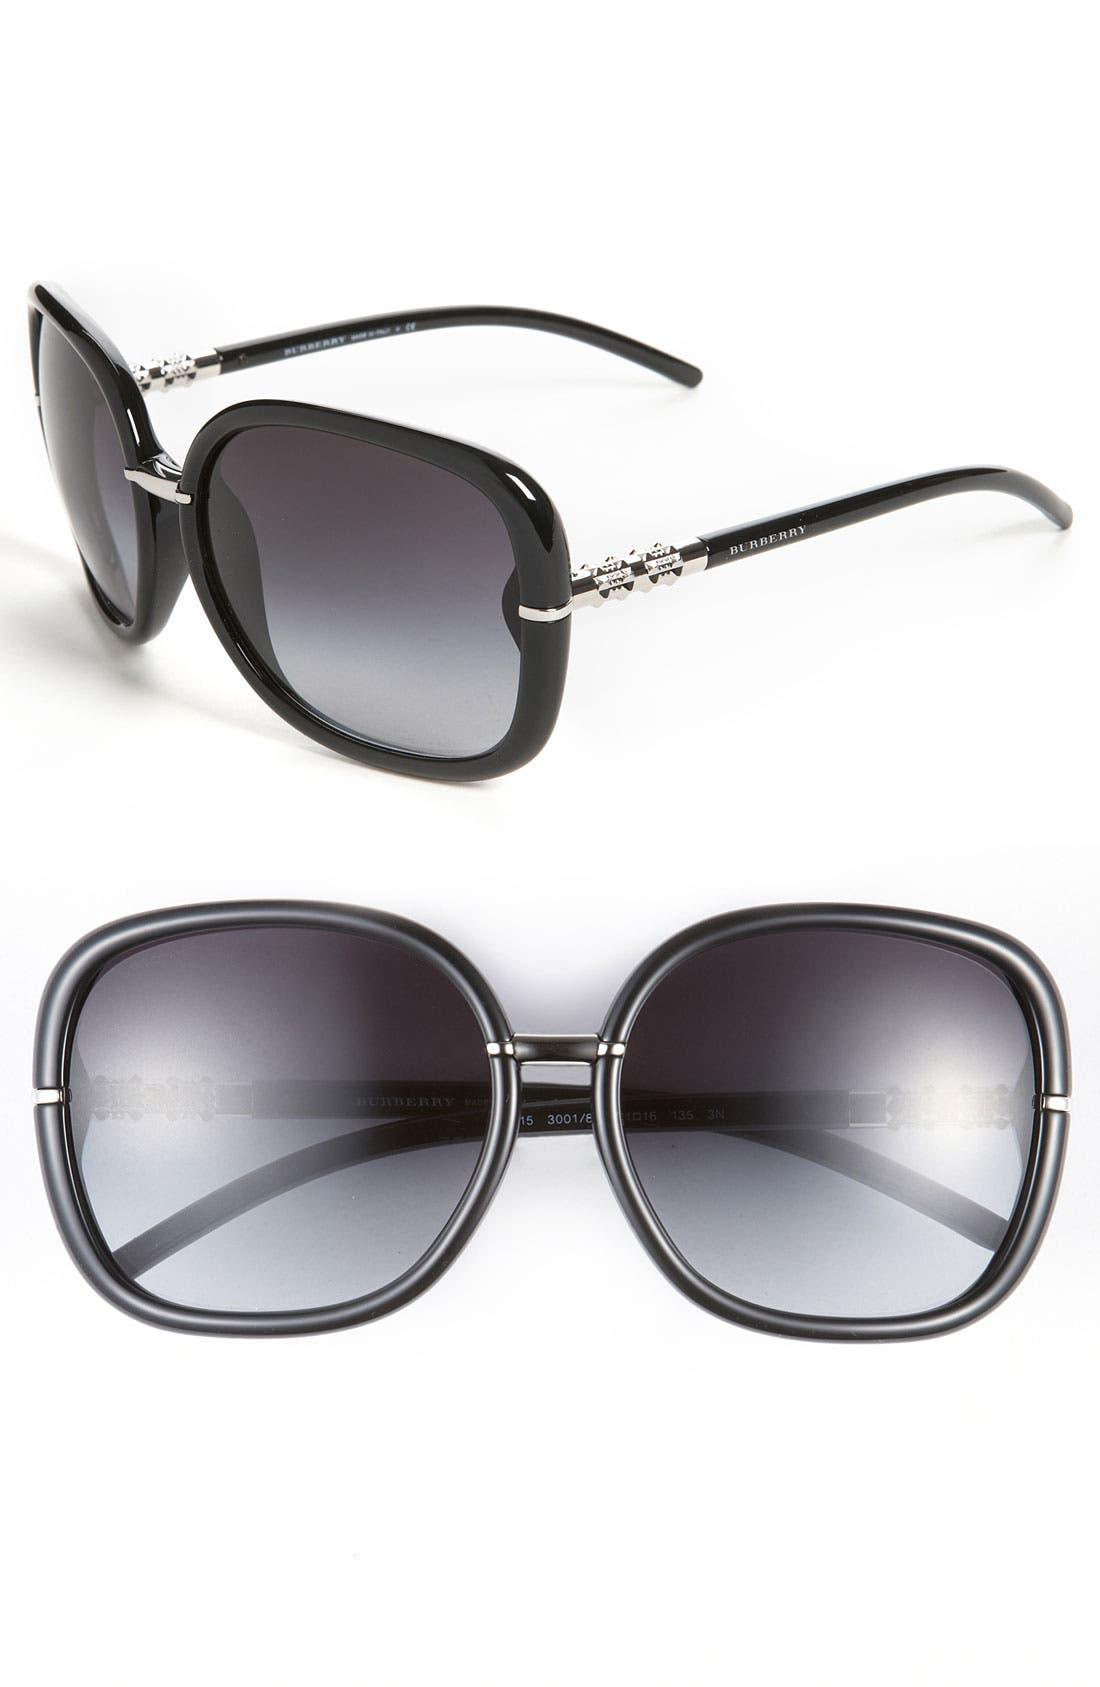 Main Image - Burberry Oversized Sunglasses